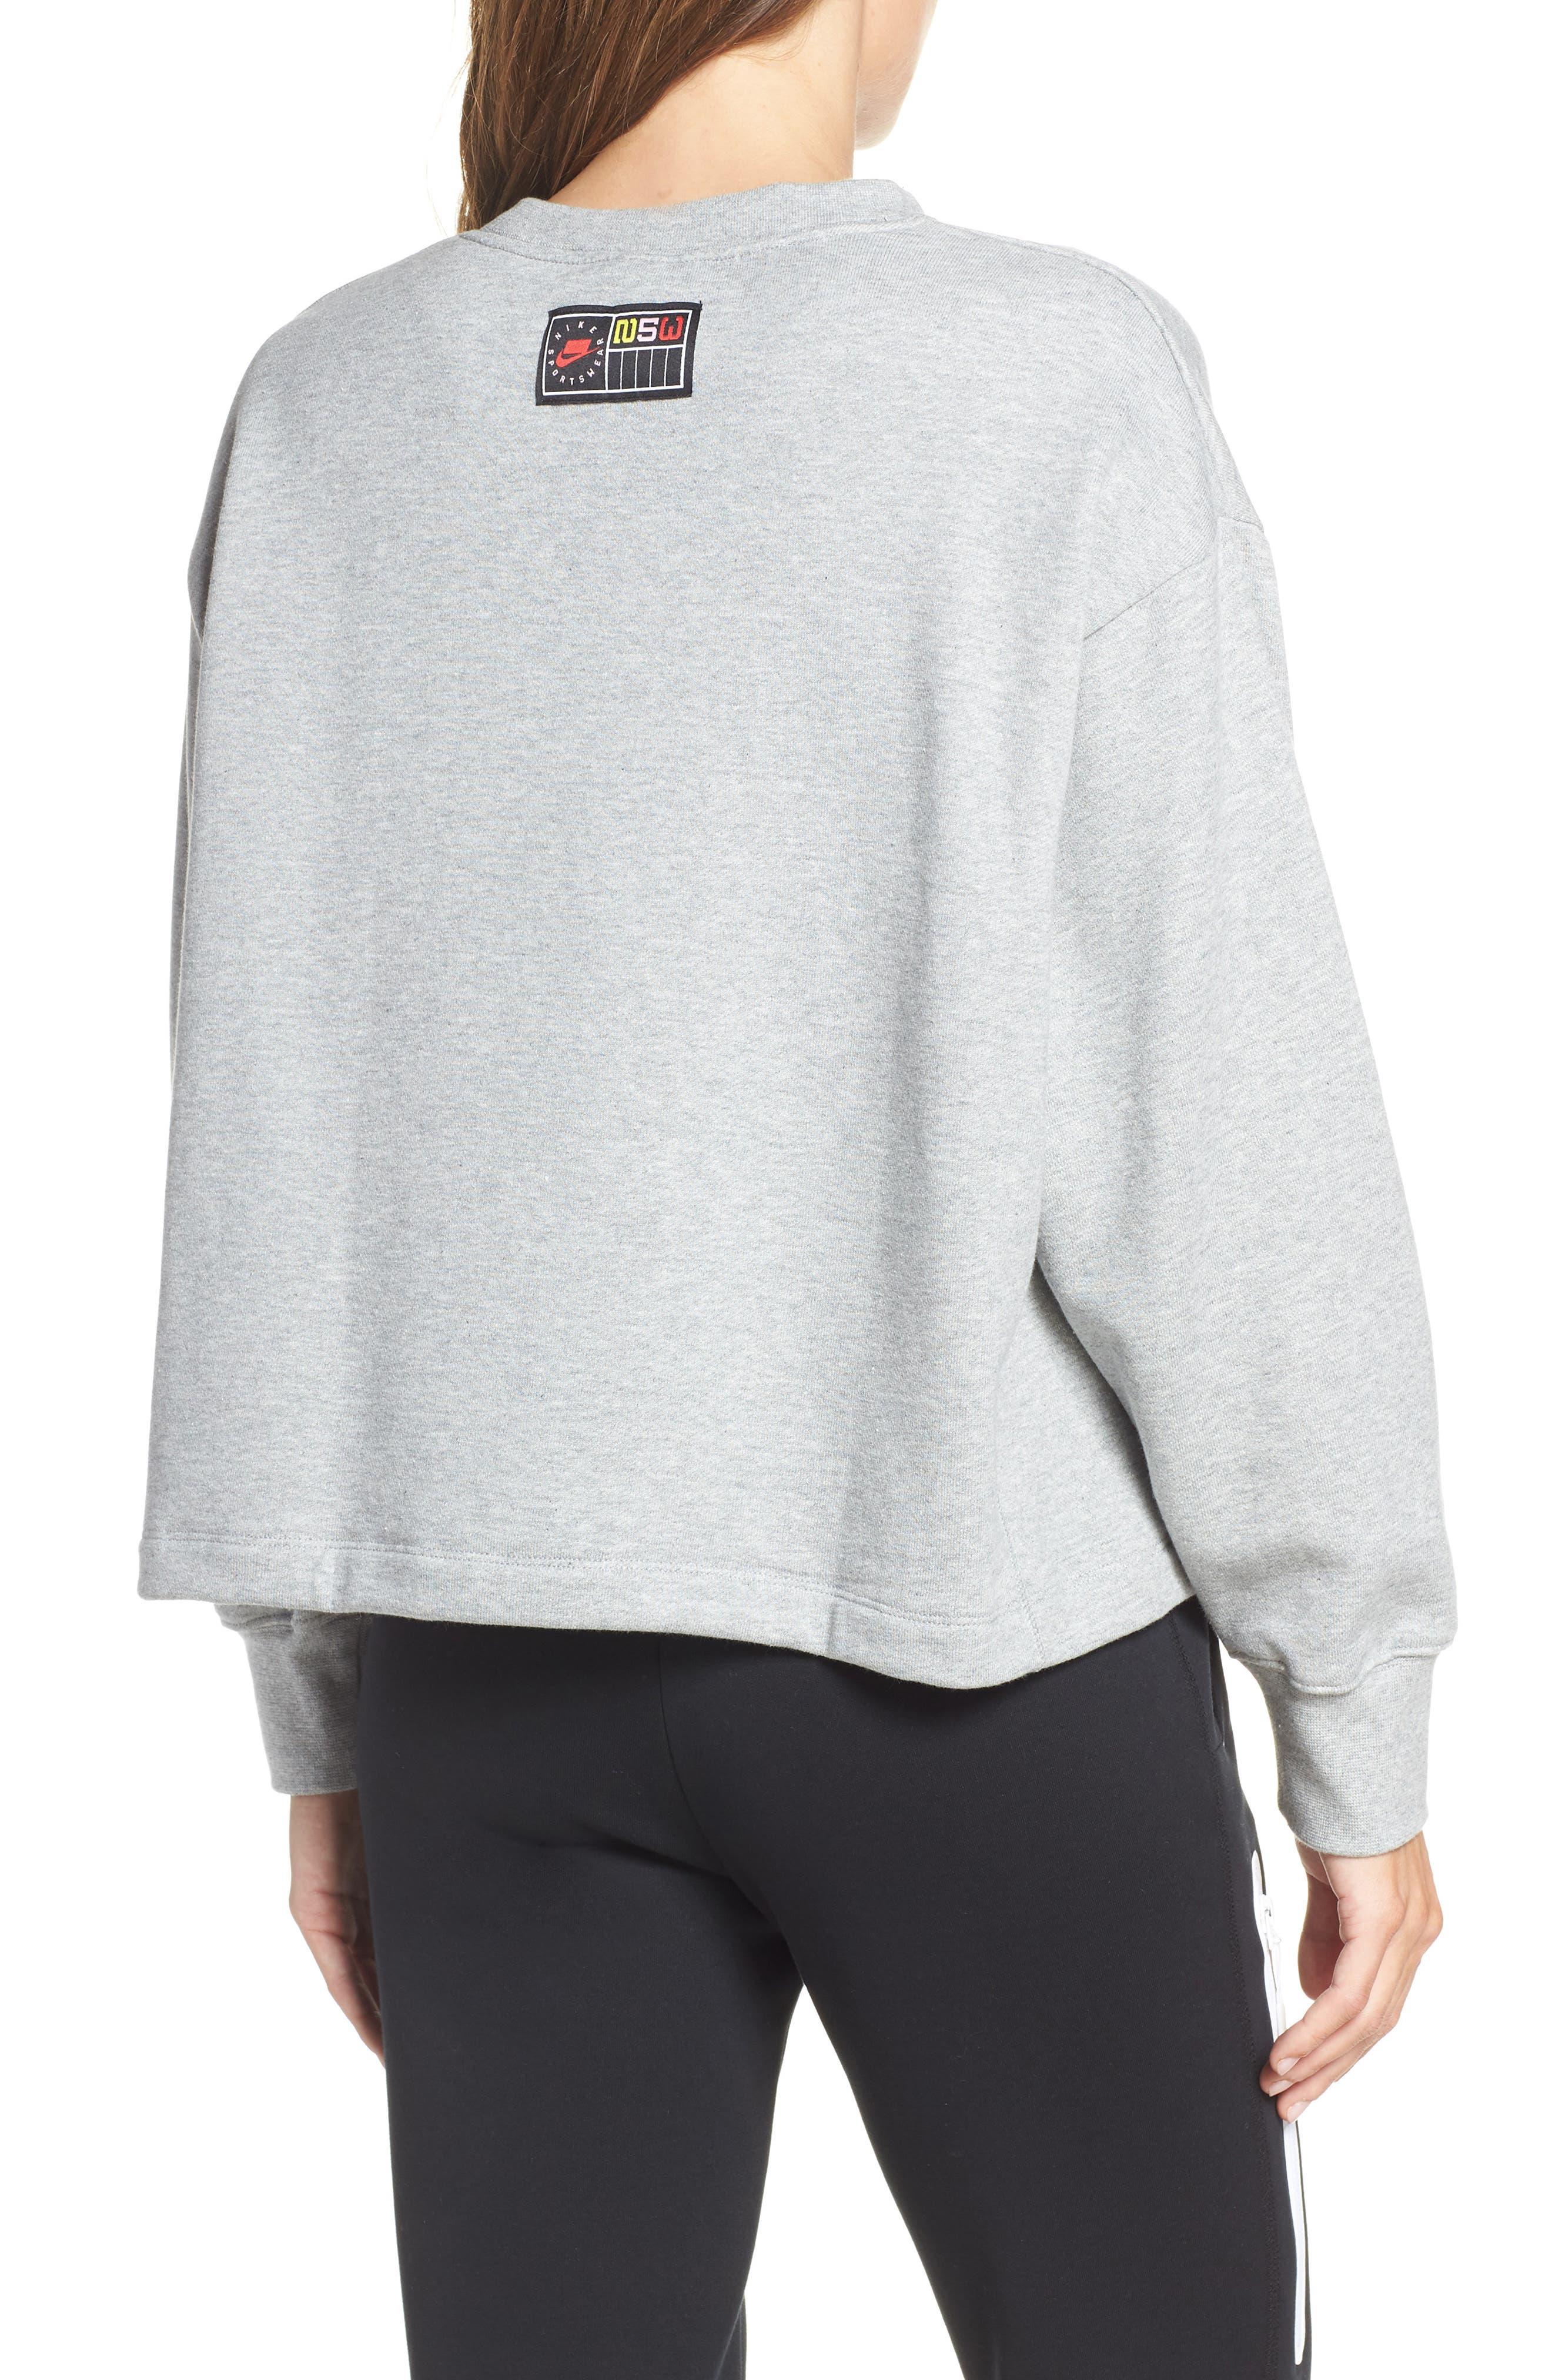 NIKE, Sportswear Logo Oversize Sweatshirt, Alternate thumbnail 2, color, DARK GREY HEATHER